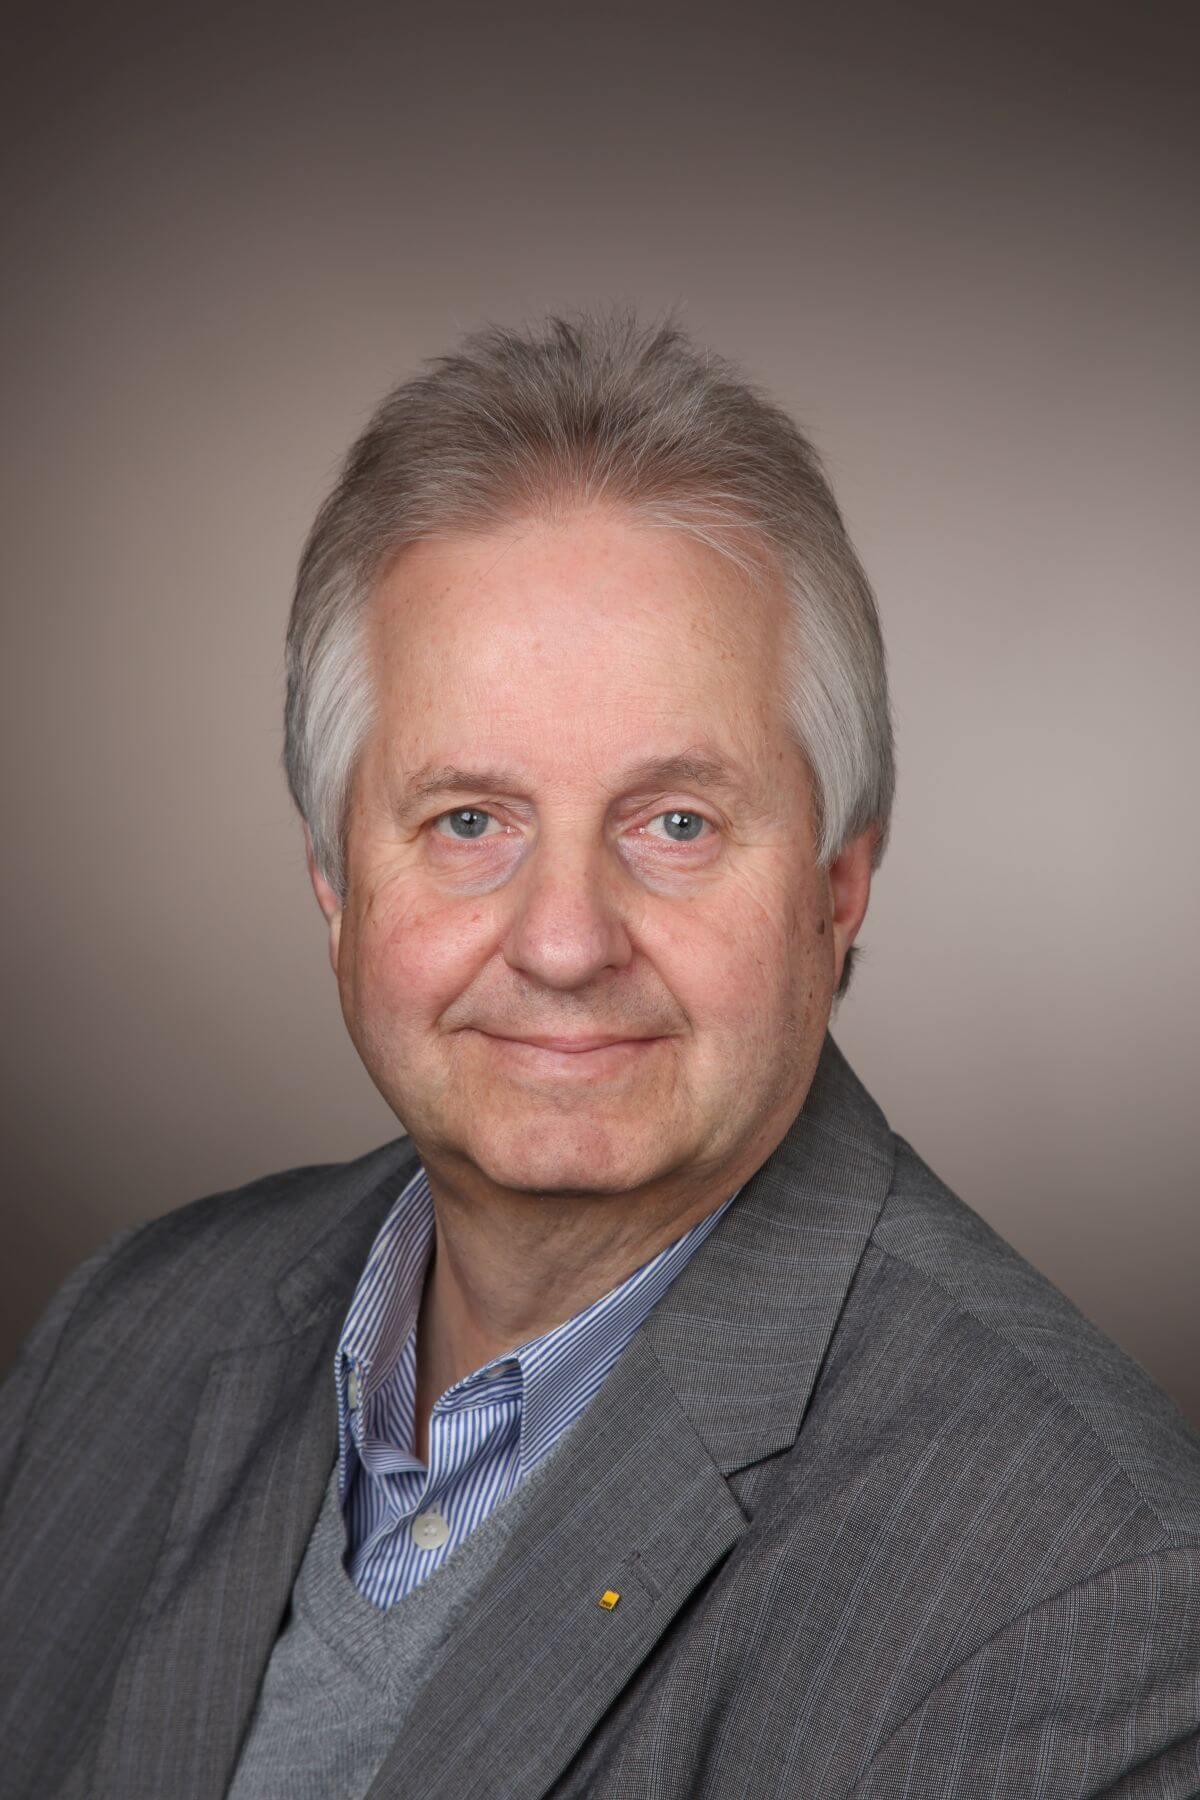 Axel Häberle